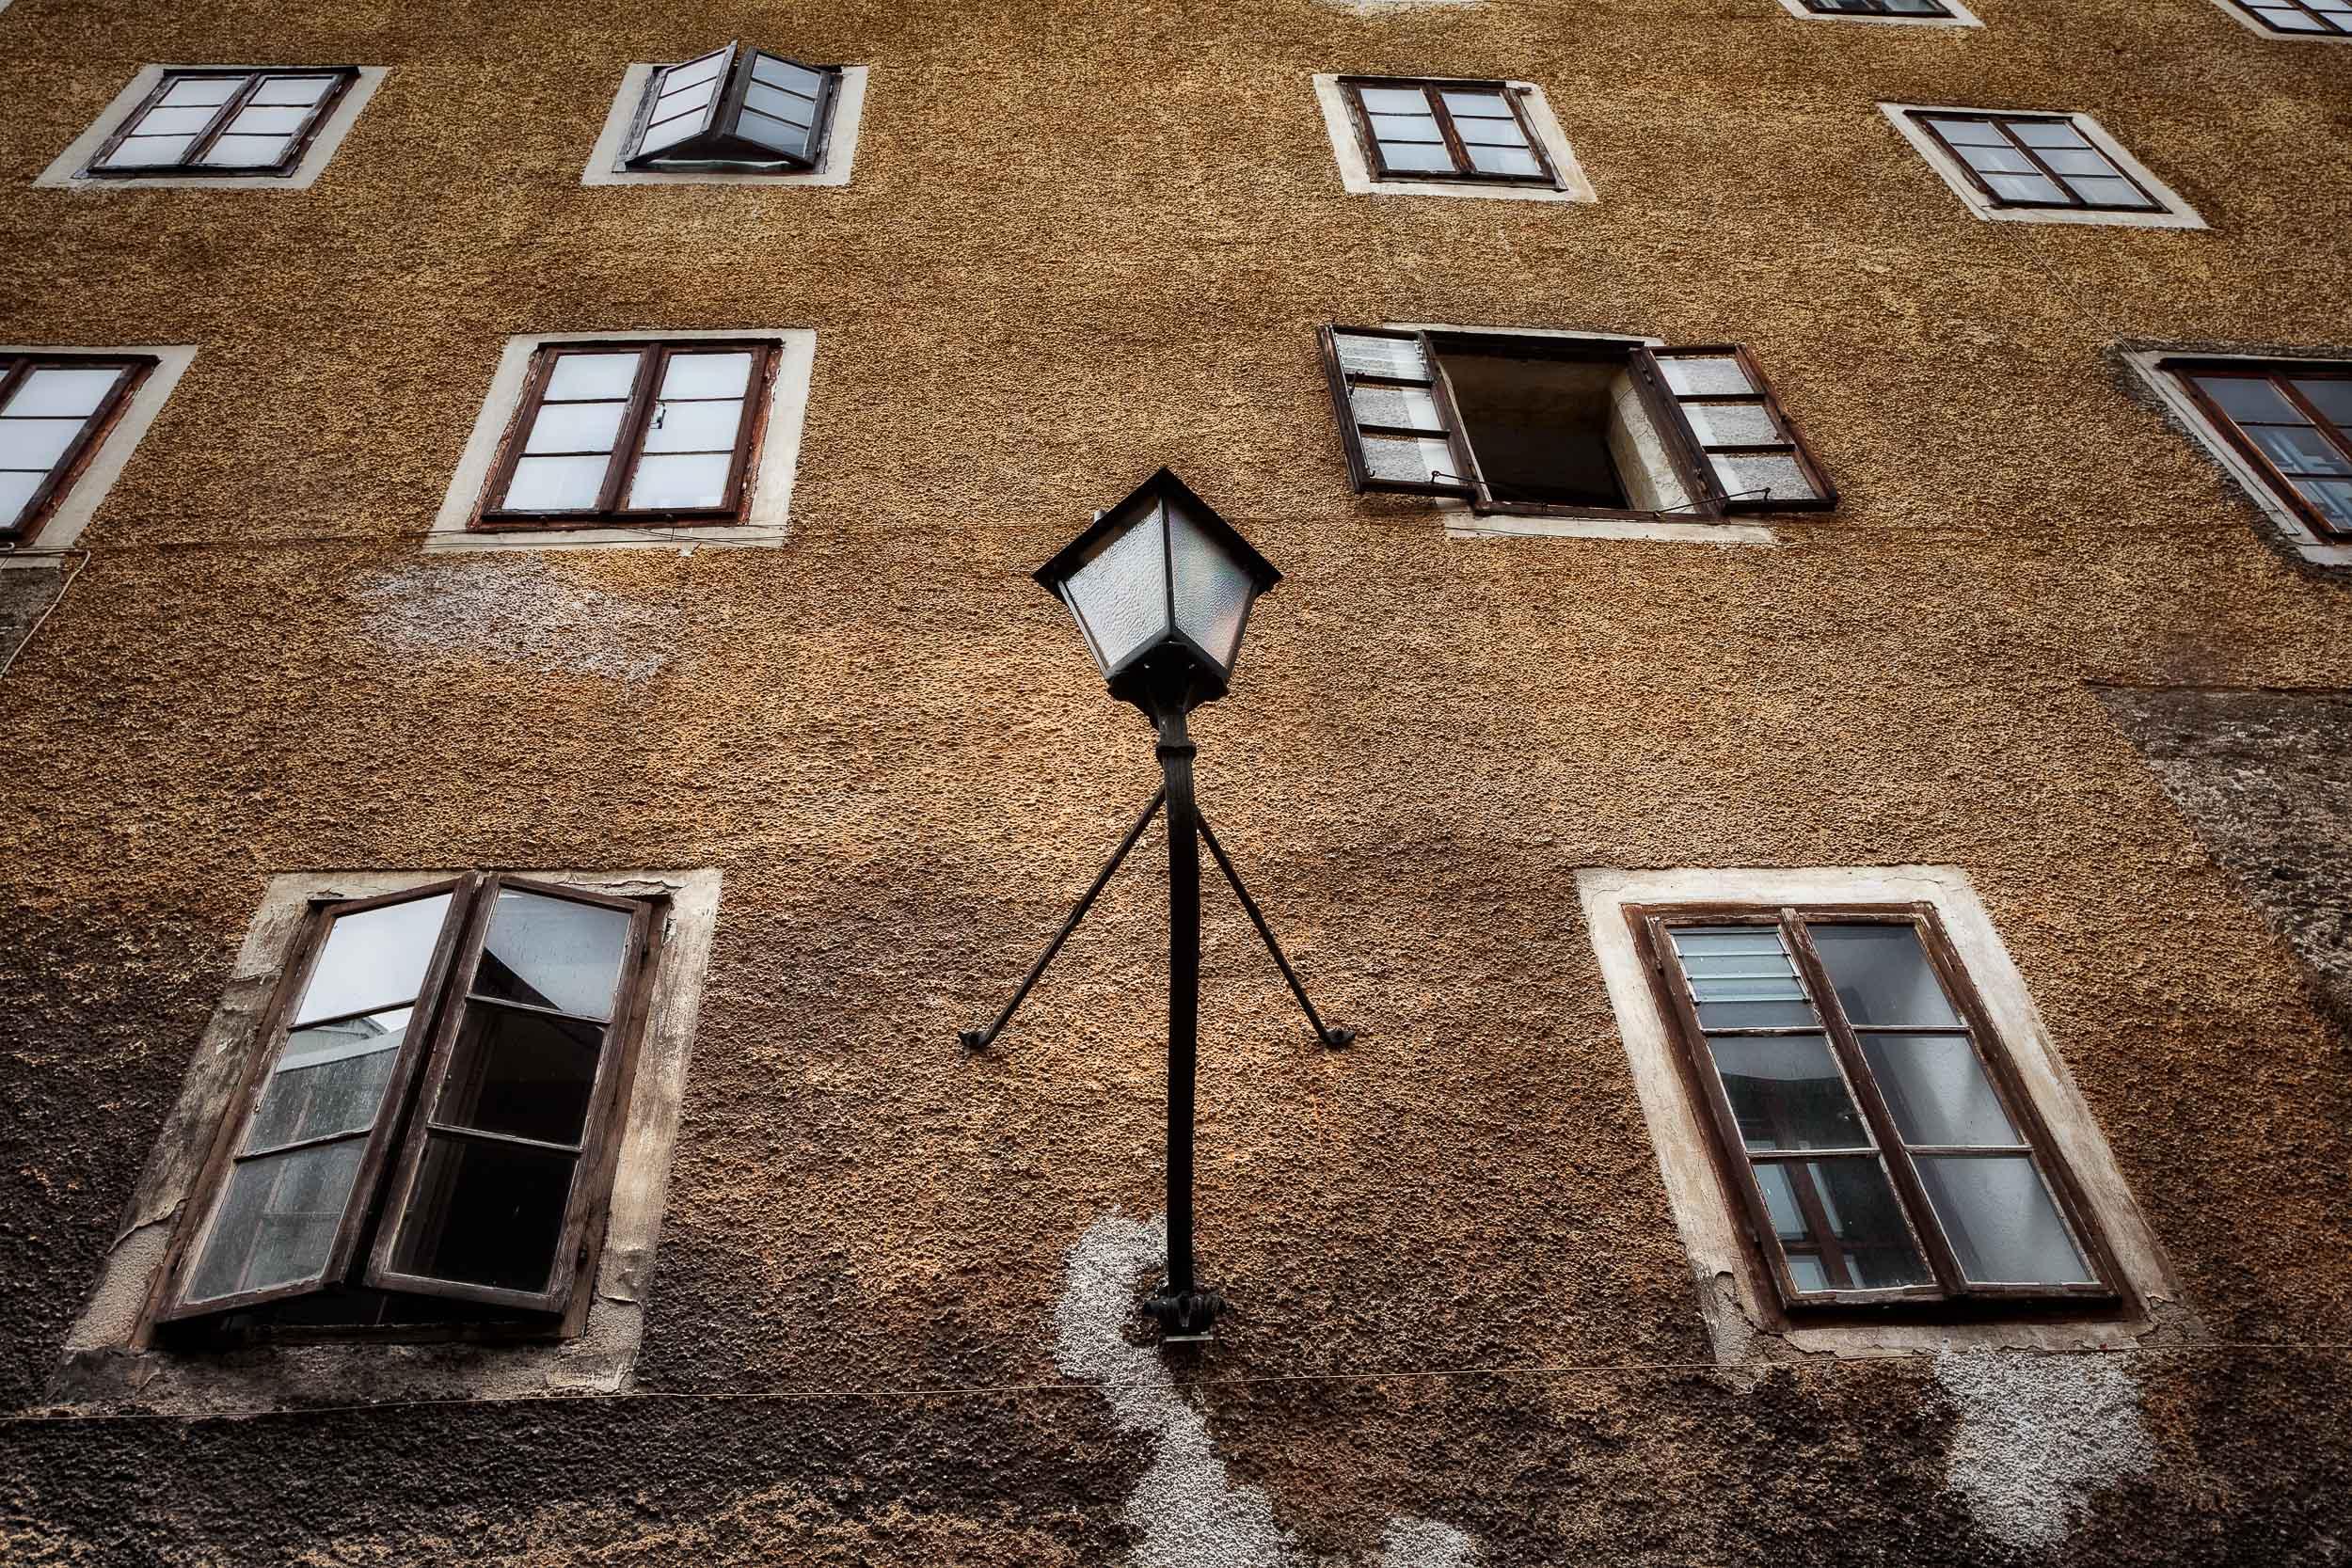 Windows and Lamp,  Salzburg, Austria